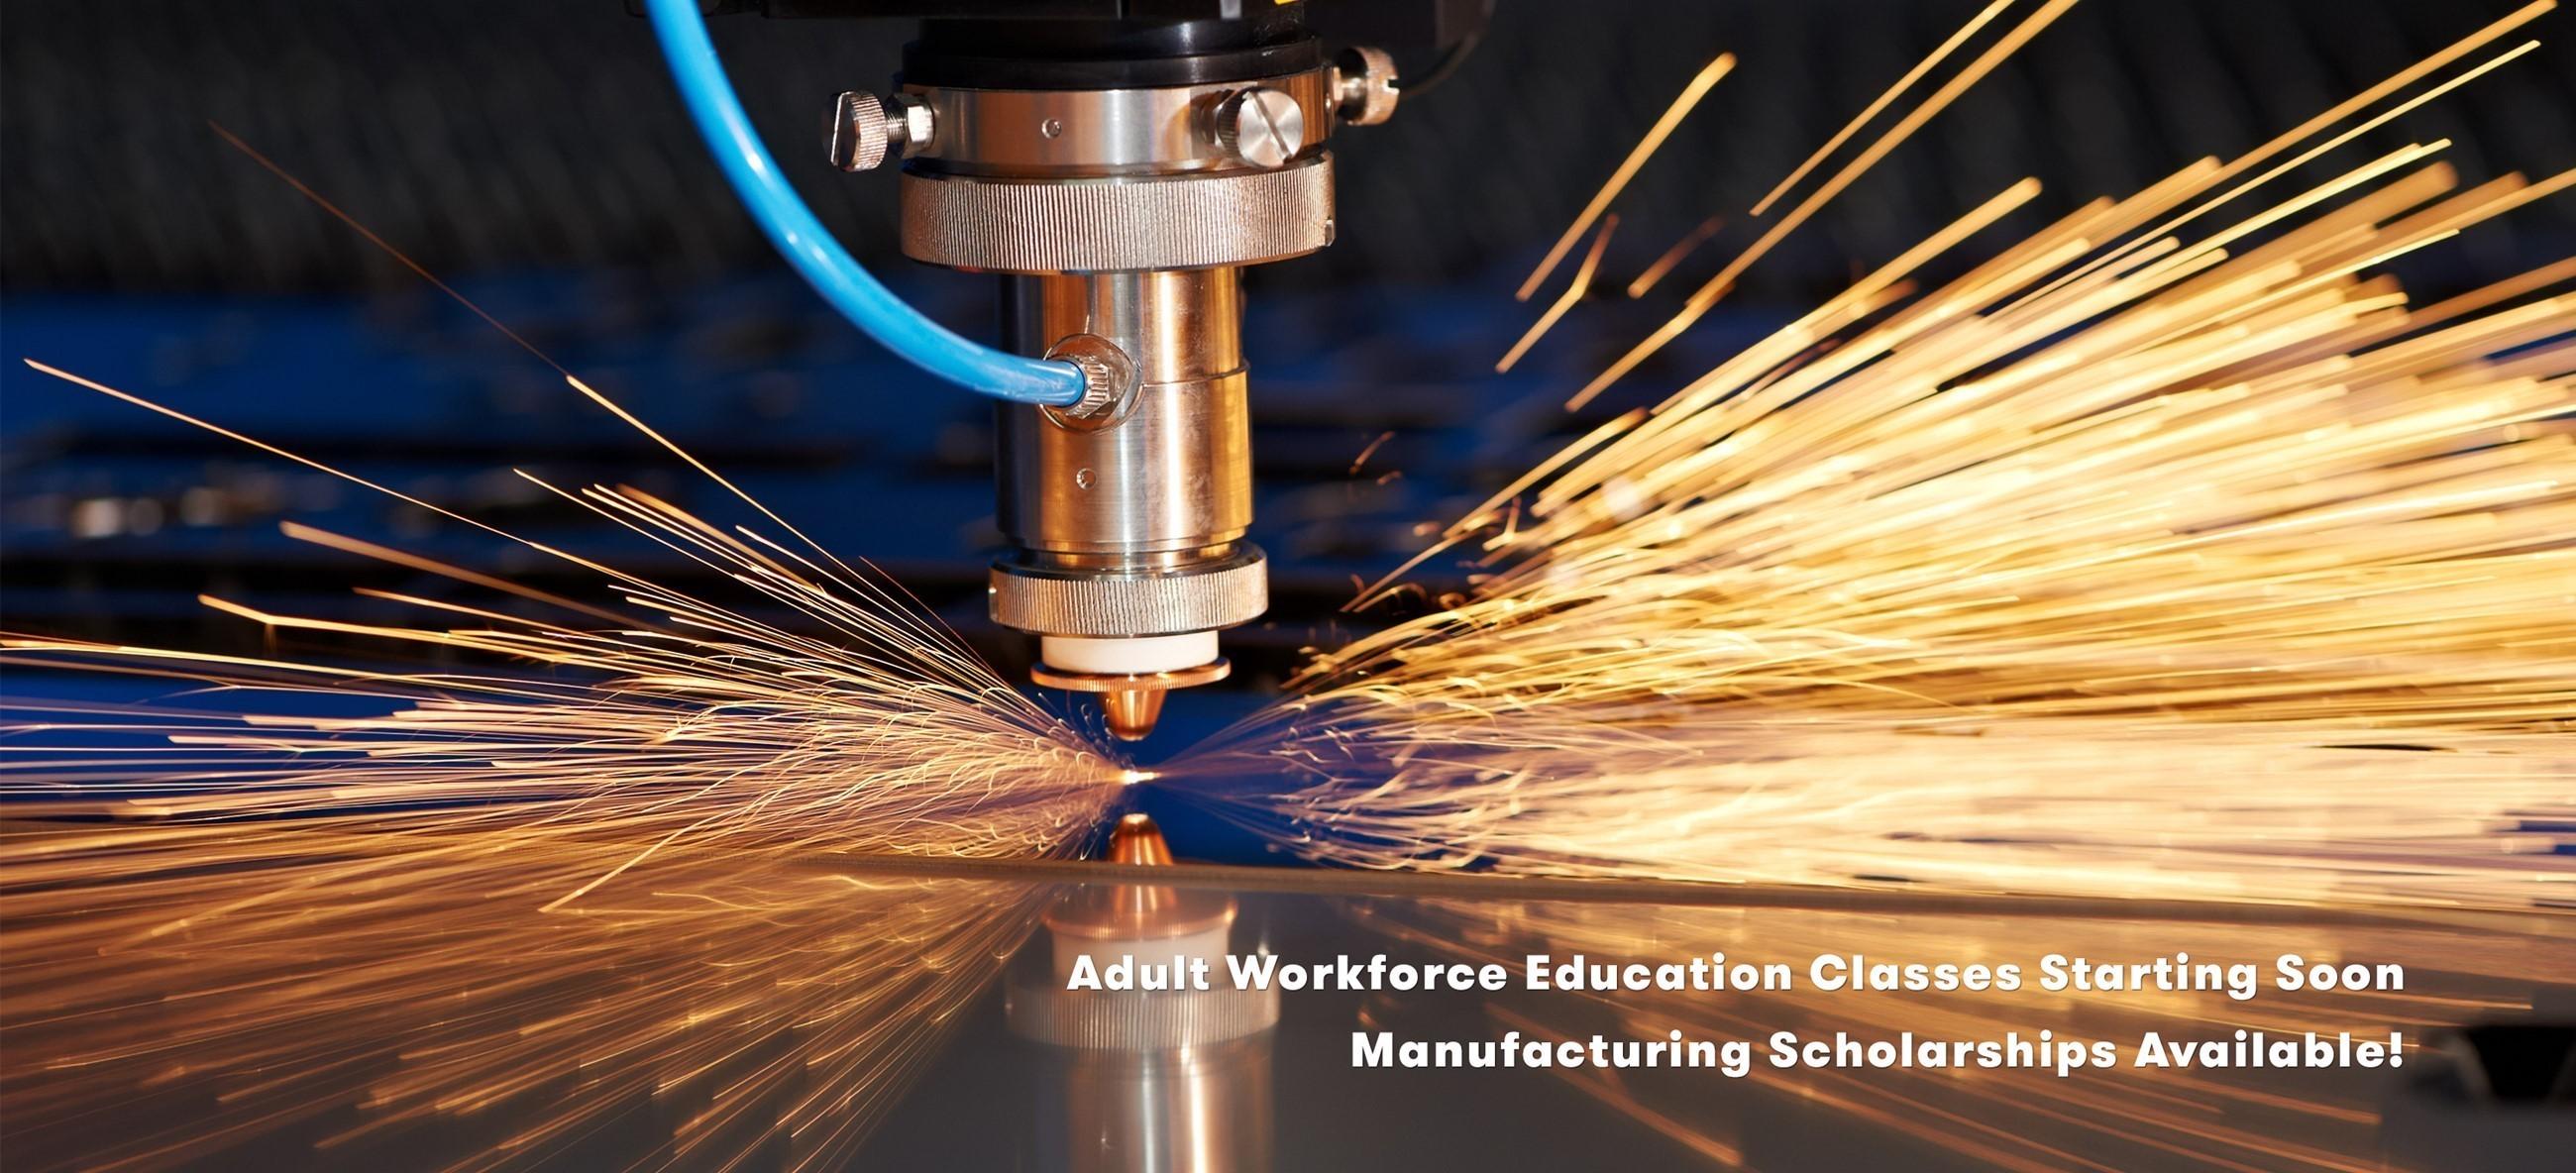 Adult Workforce Classes Start Soon